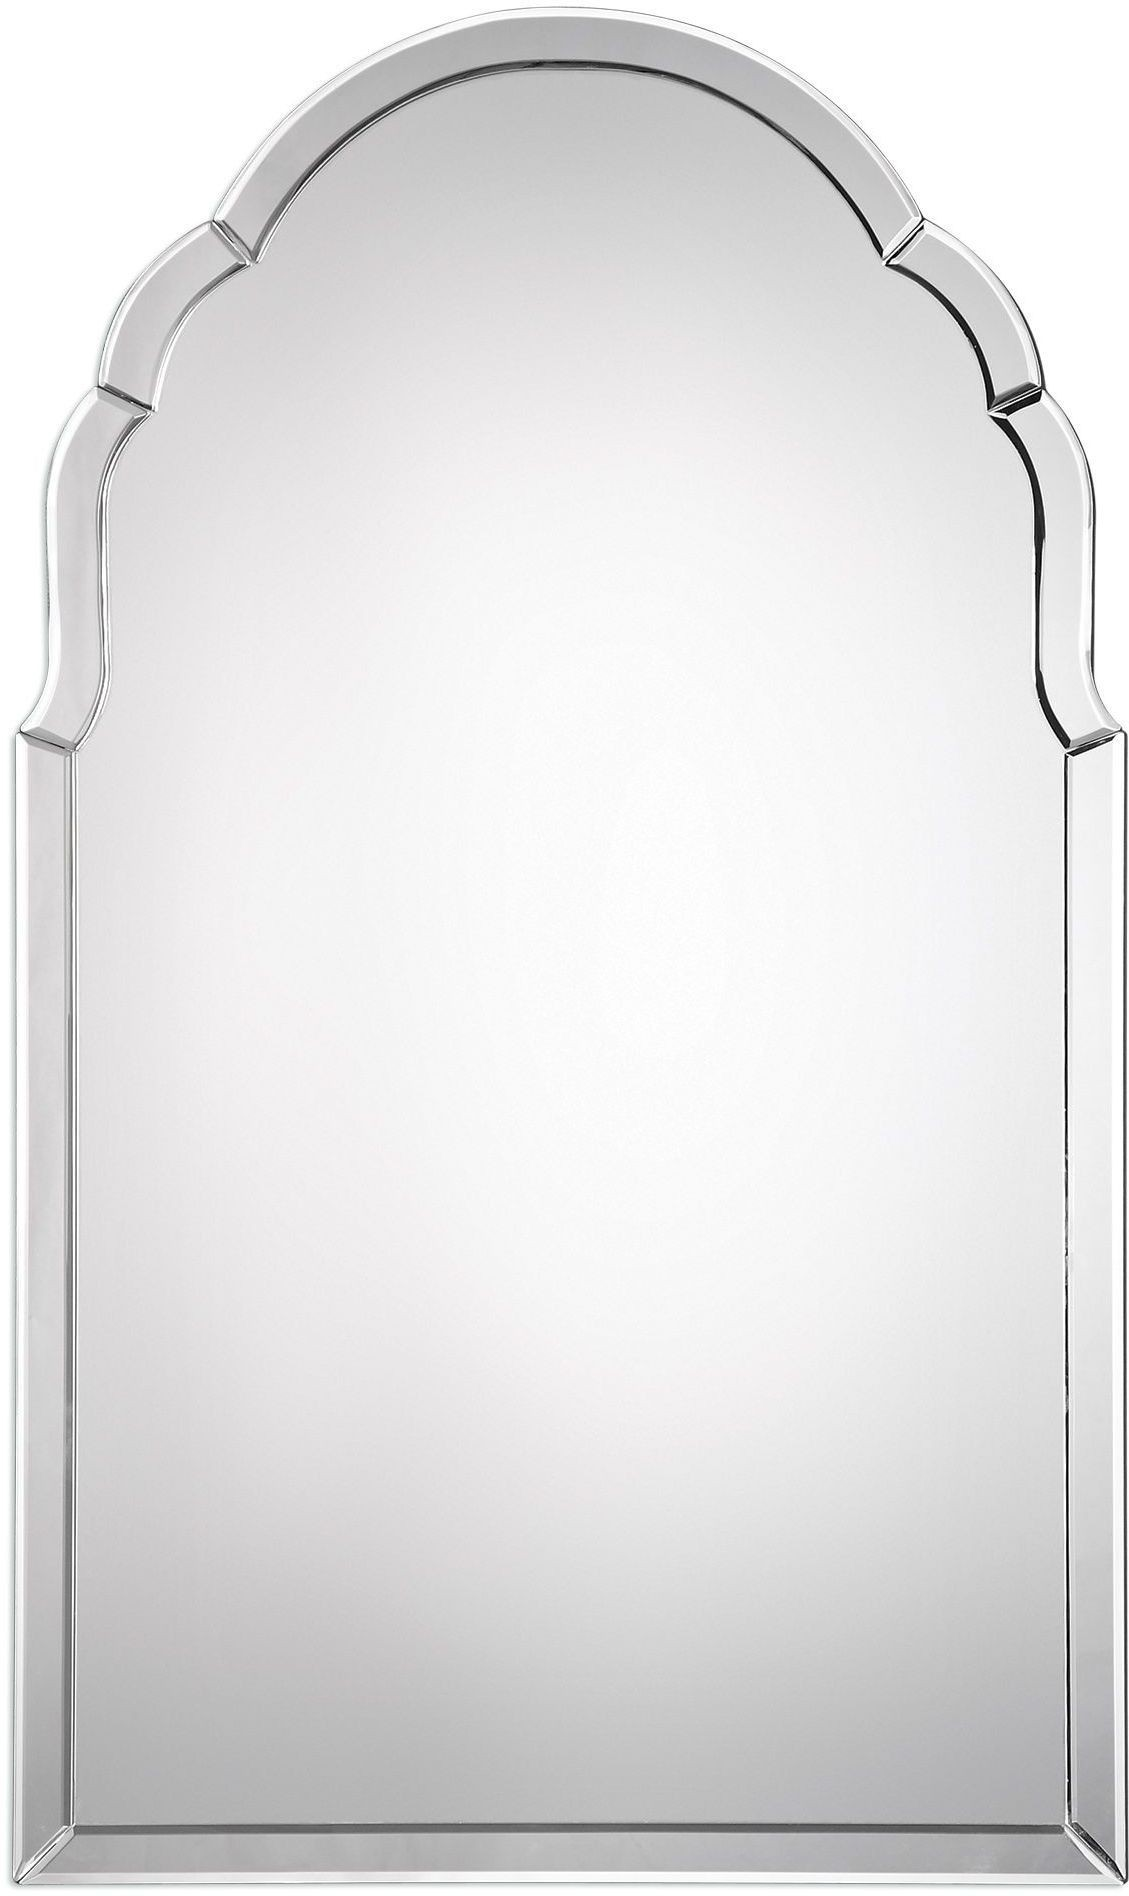 Brayden Silver Frameless Arched Mirror From Uttermost